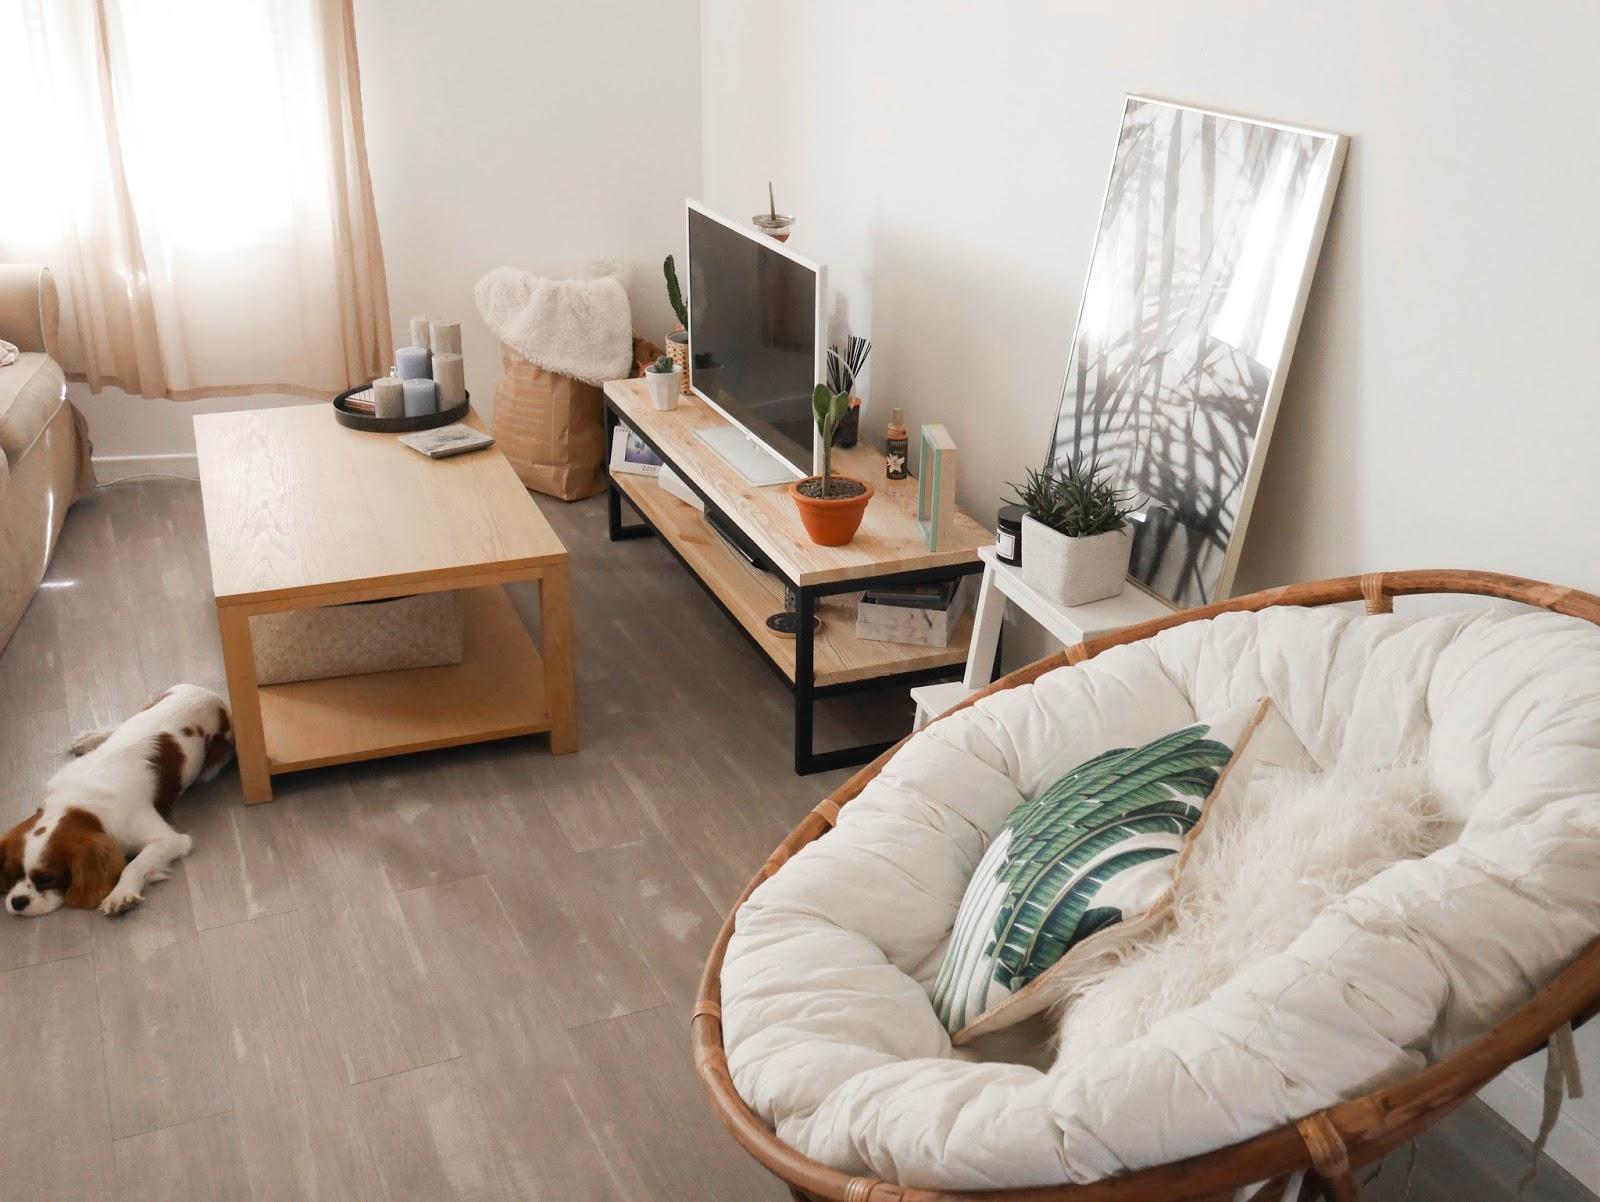 meuble tv le grenier alpin parisgrenoble